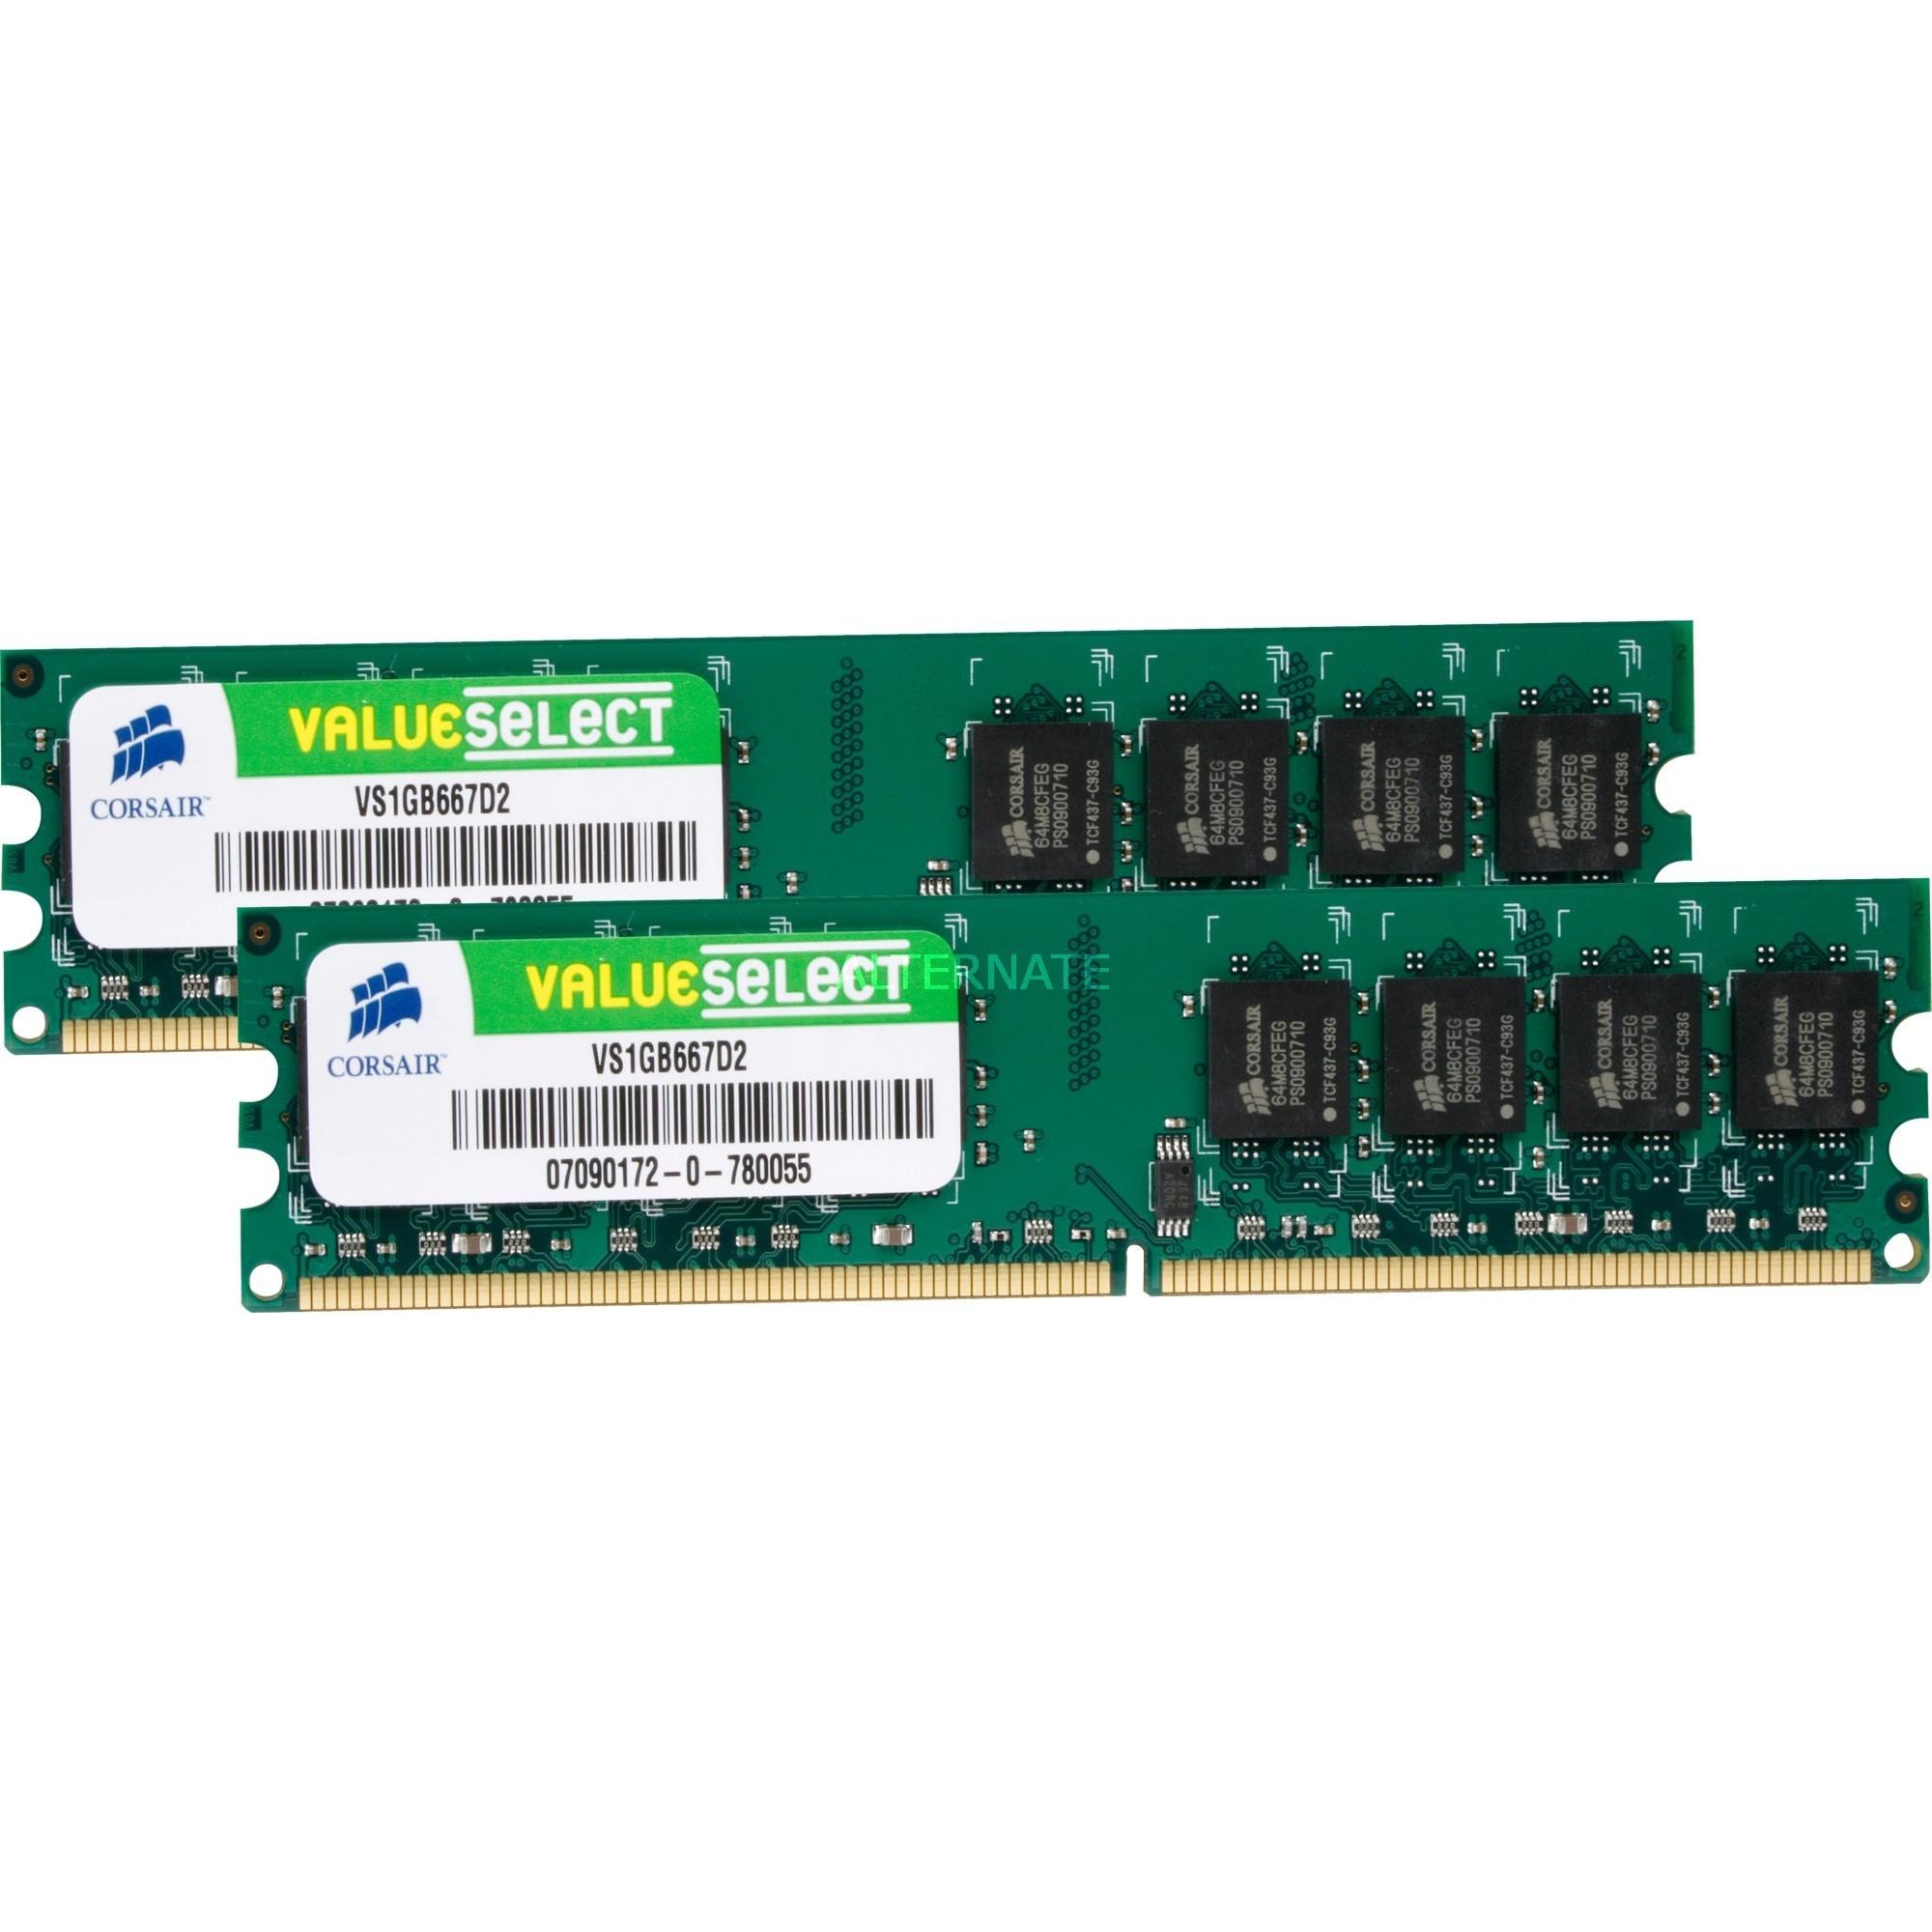 2GB DDR2 SDRAM DIMMs módulo de memoria 667 MHz, Memoria RAM